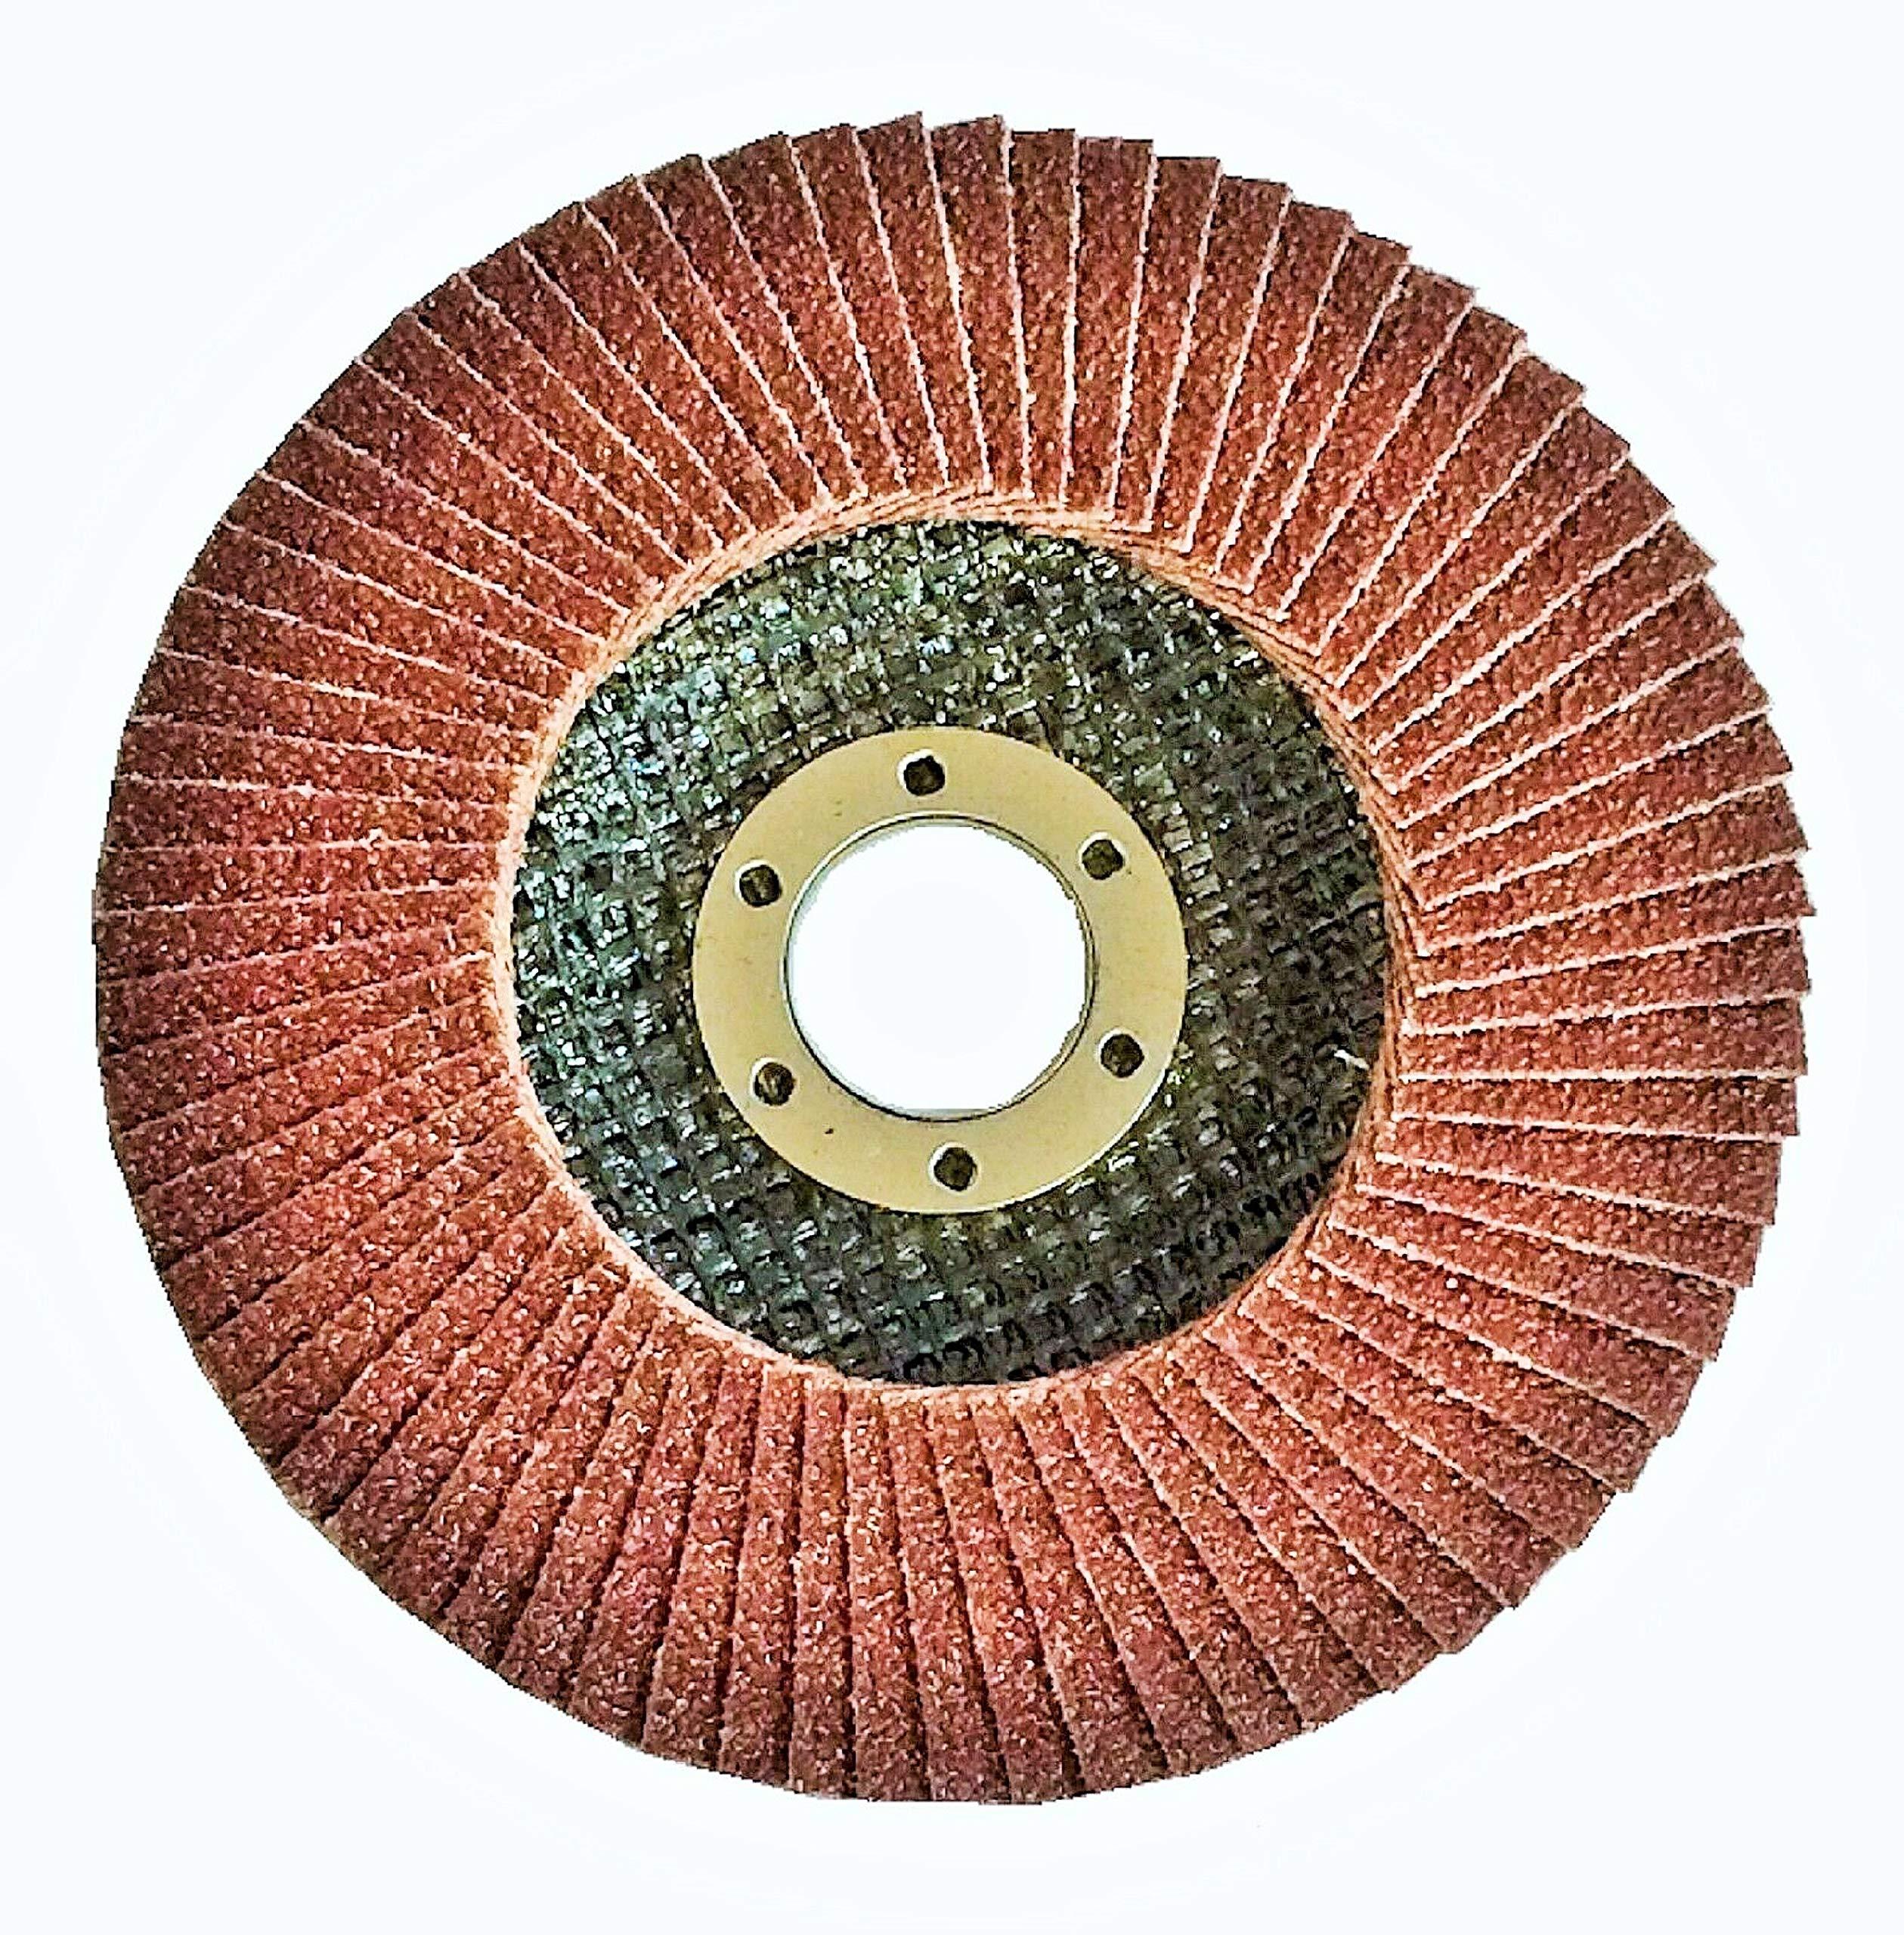 WennoW (100-PC) 5'' x 7/8'' PREMIUM ZIRCONIA GRINDING WHEEL FLAP DISC 40 GRIT NEW